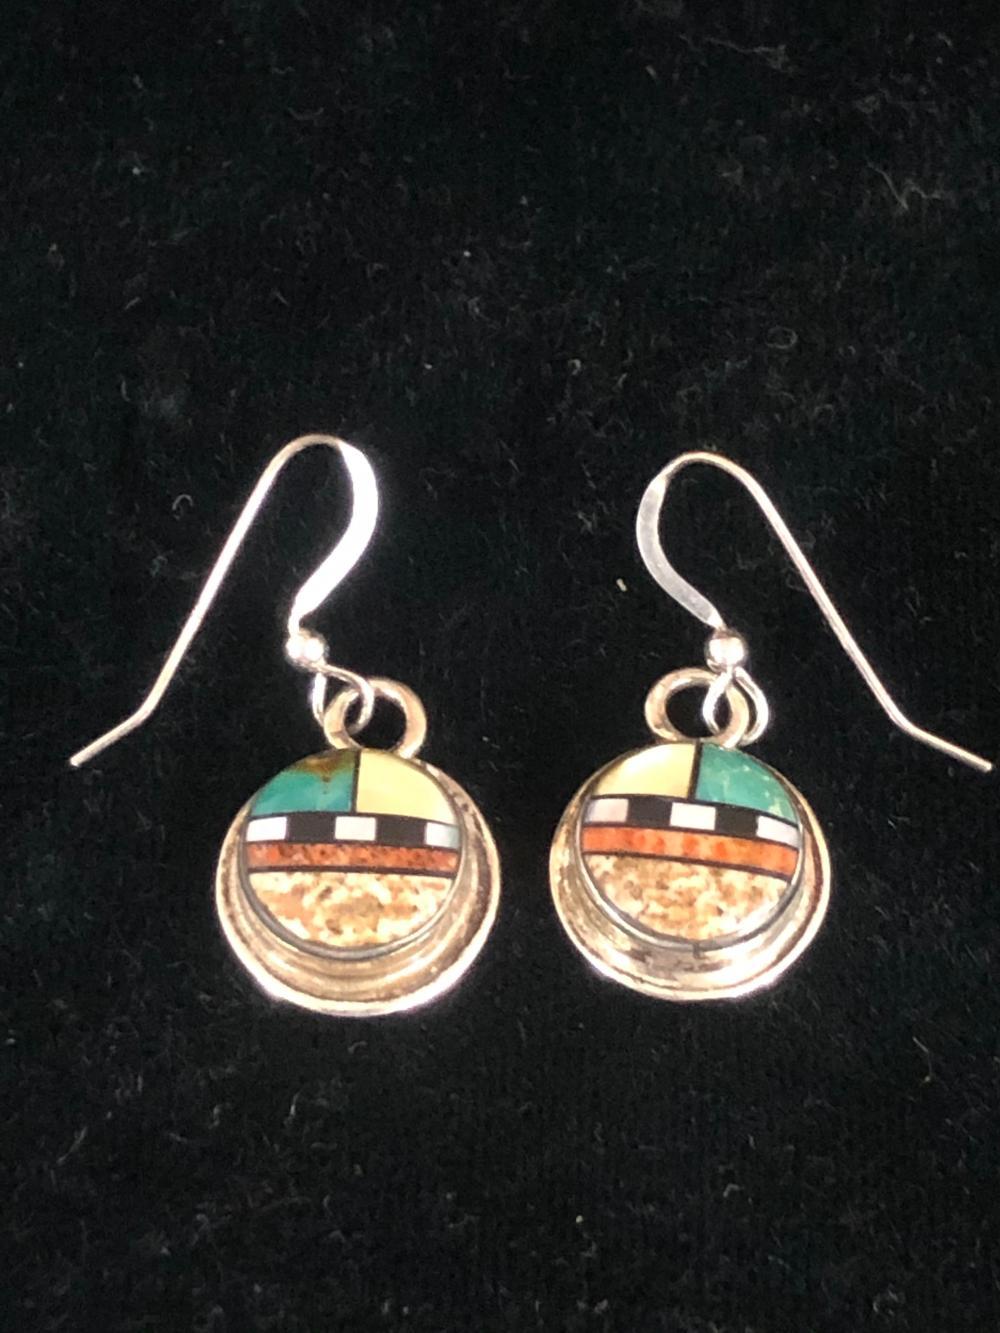 Multiple stone inlay sterling silver earrings